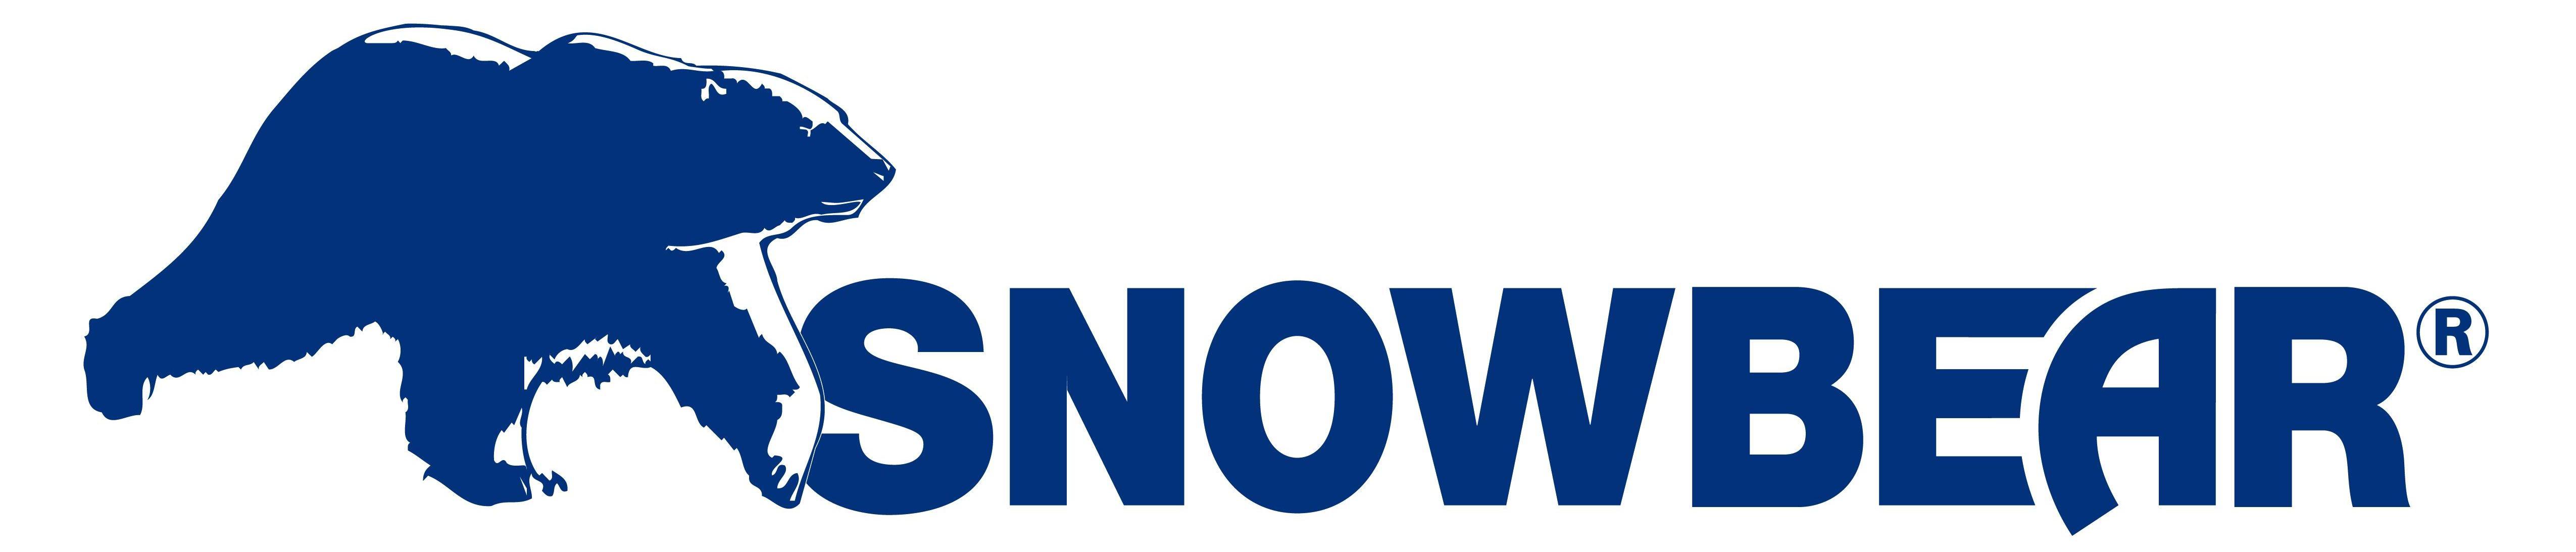 Snowbear Logo